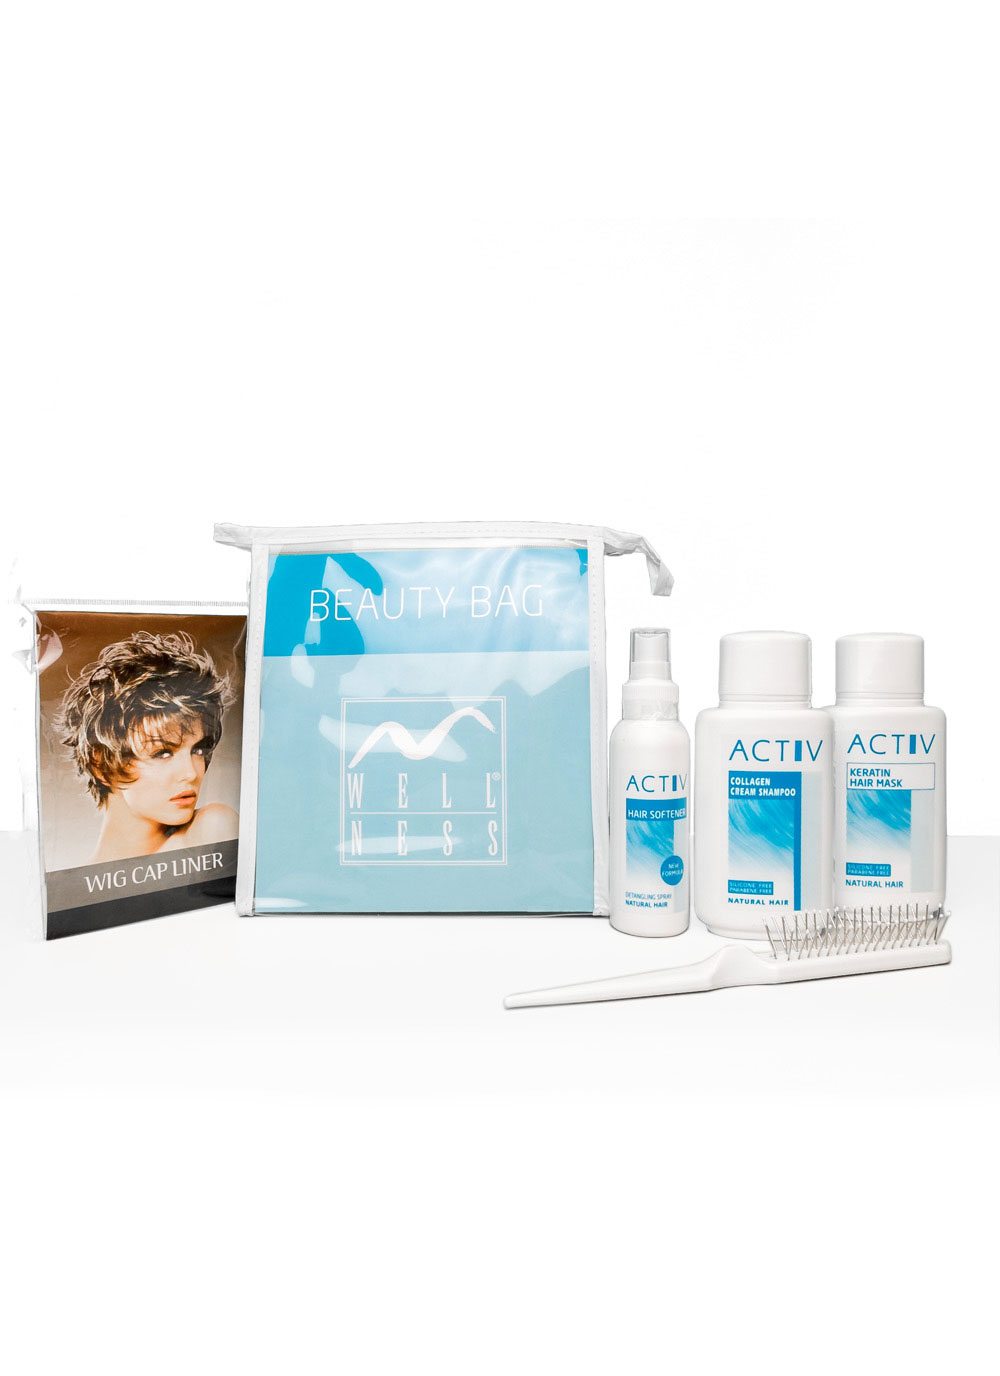 GFH Zubehör  - Activ Beauty Bag Pflegeset Echthaar